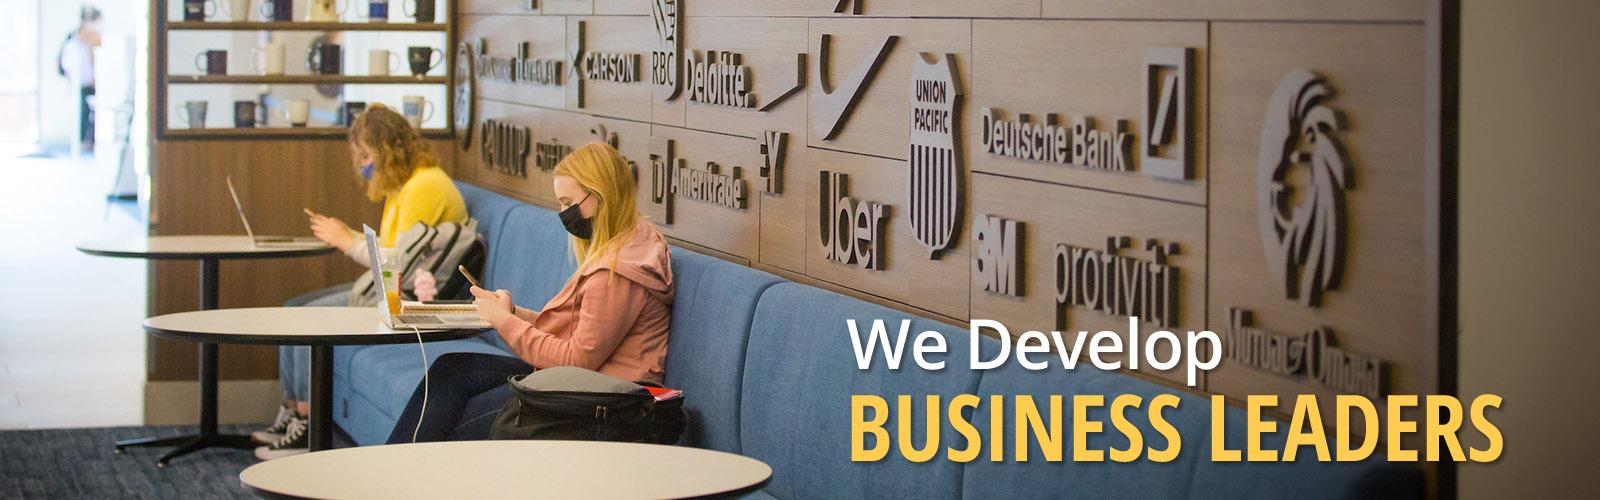 We develop business leaders | Creighton University | Heider College of Business